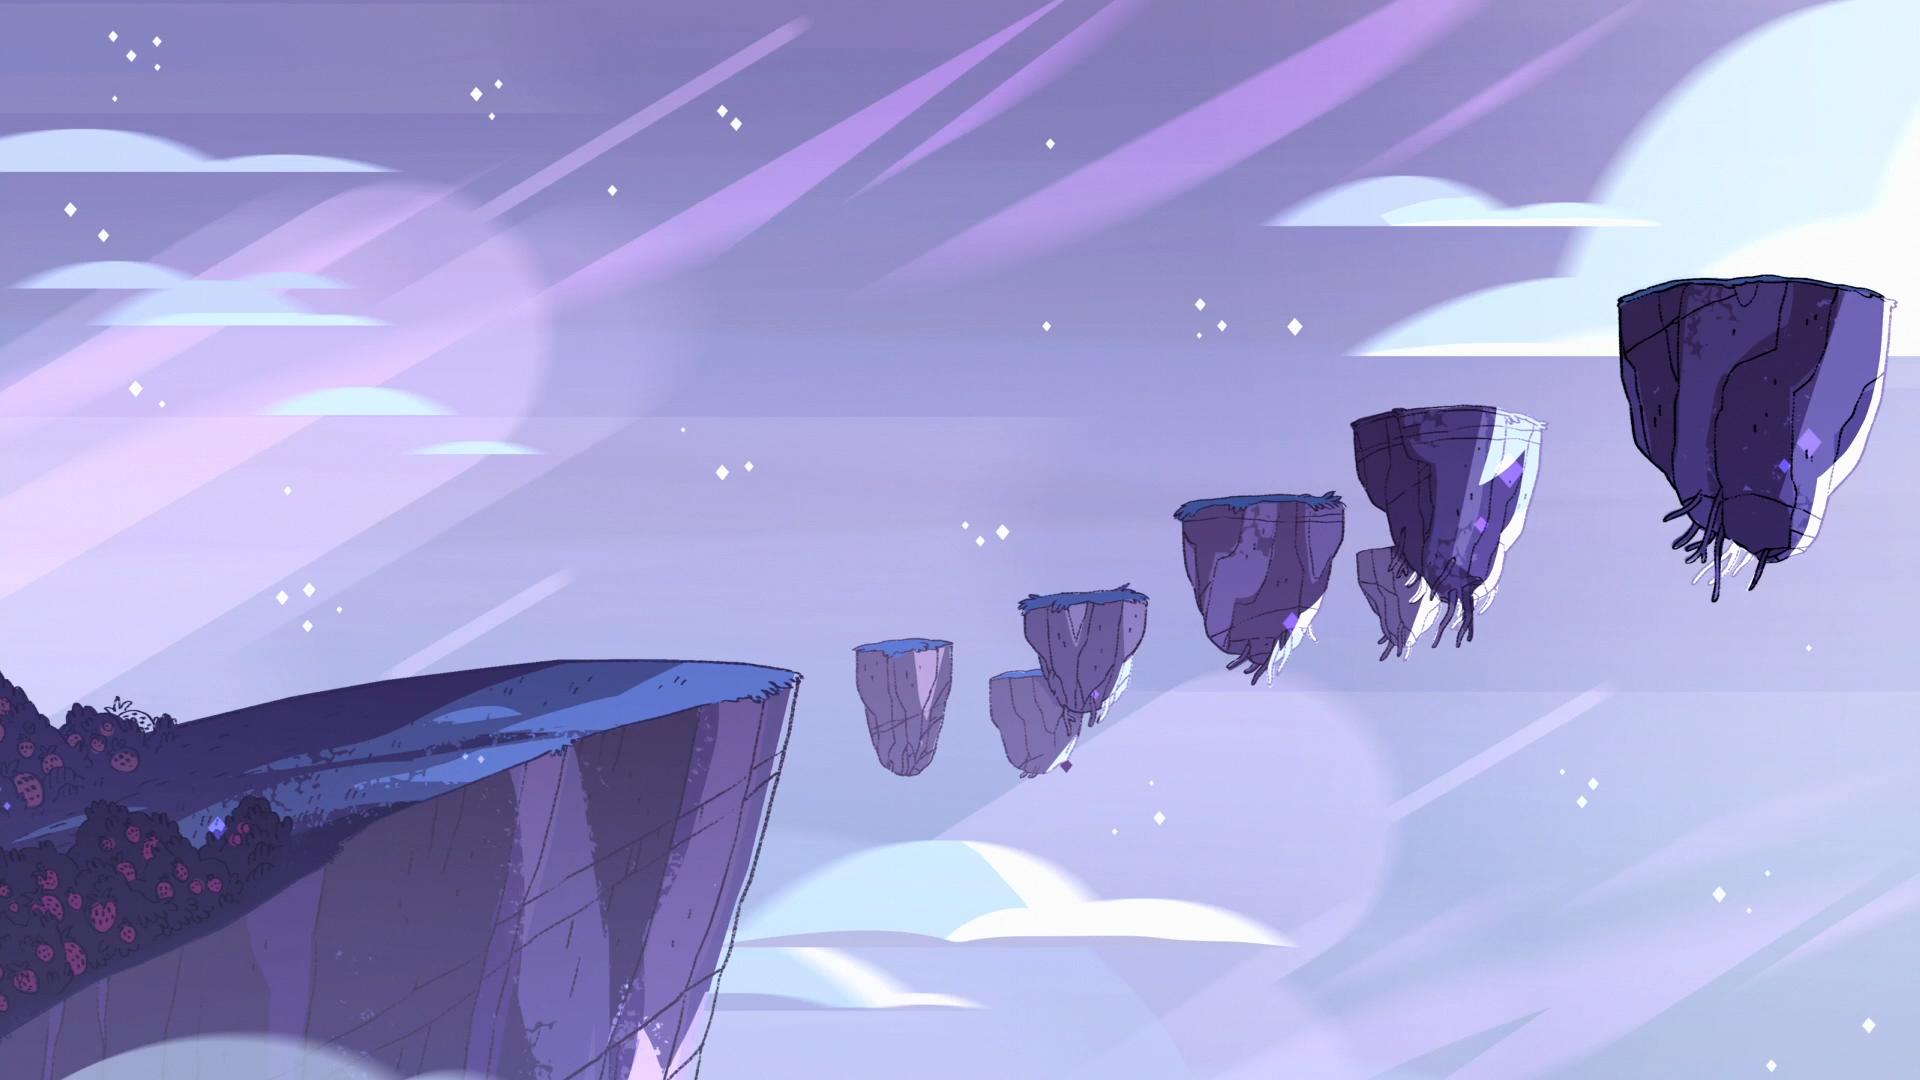 Steven Universe Desktop Backgrounds 2229409 Hd